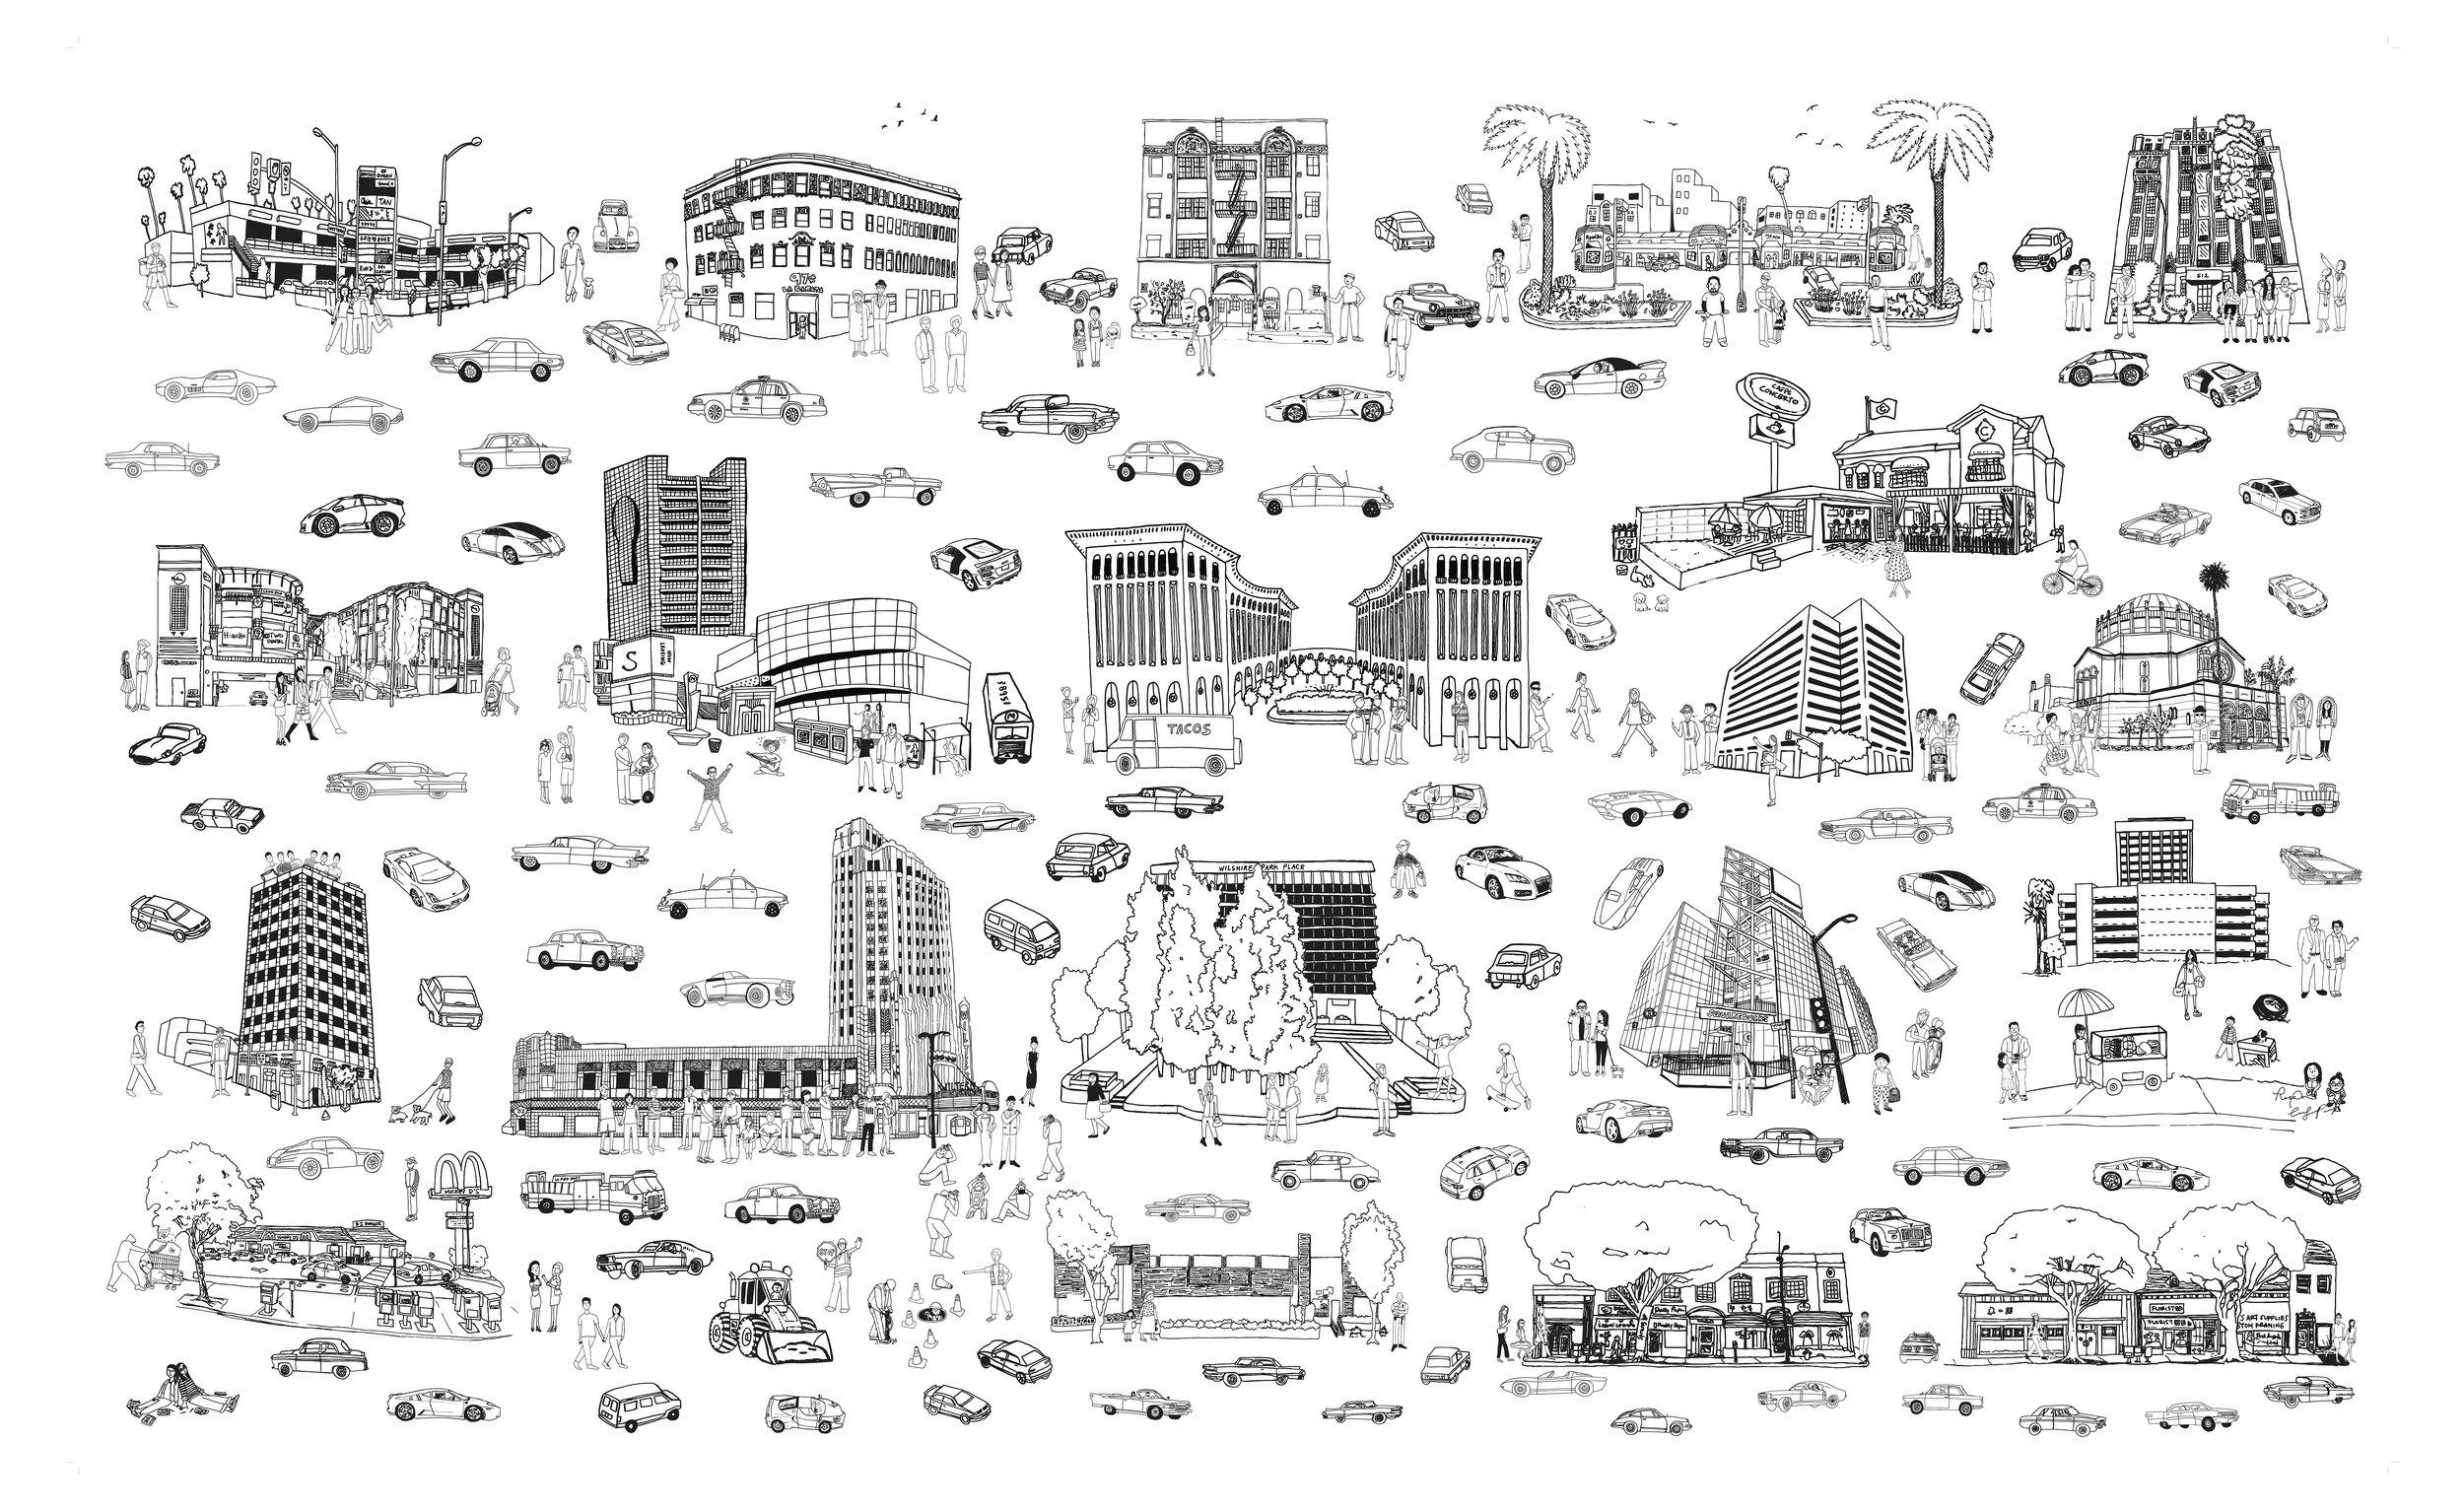 caffe_concerto_map_wallpaper_final copy 2.jpg